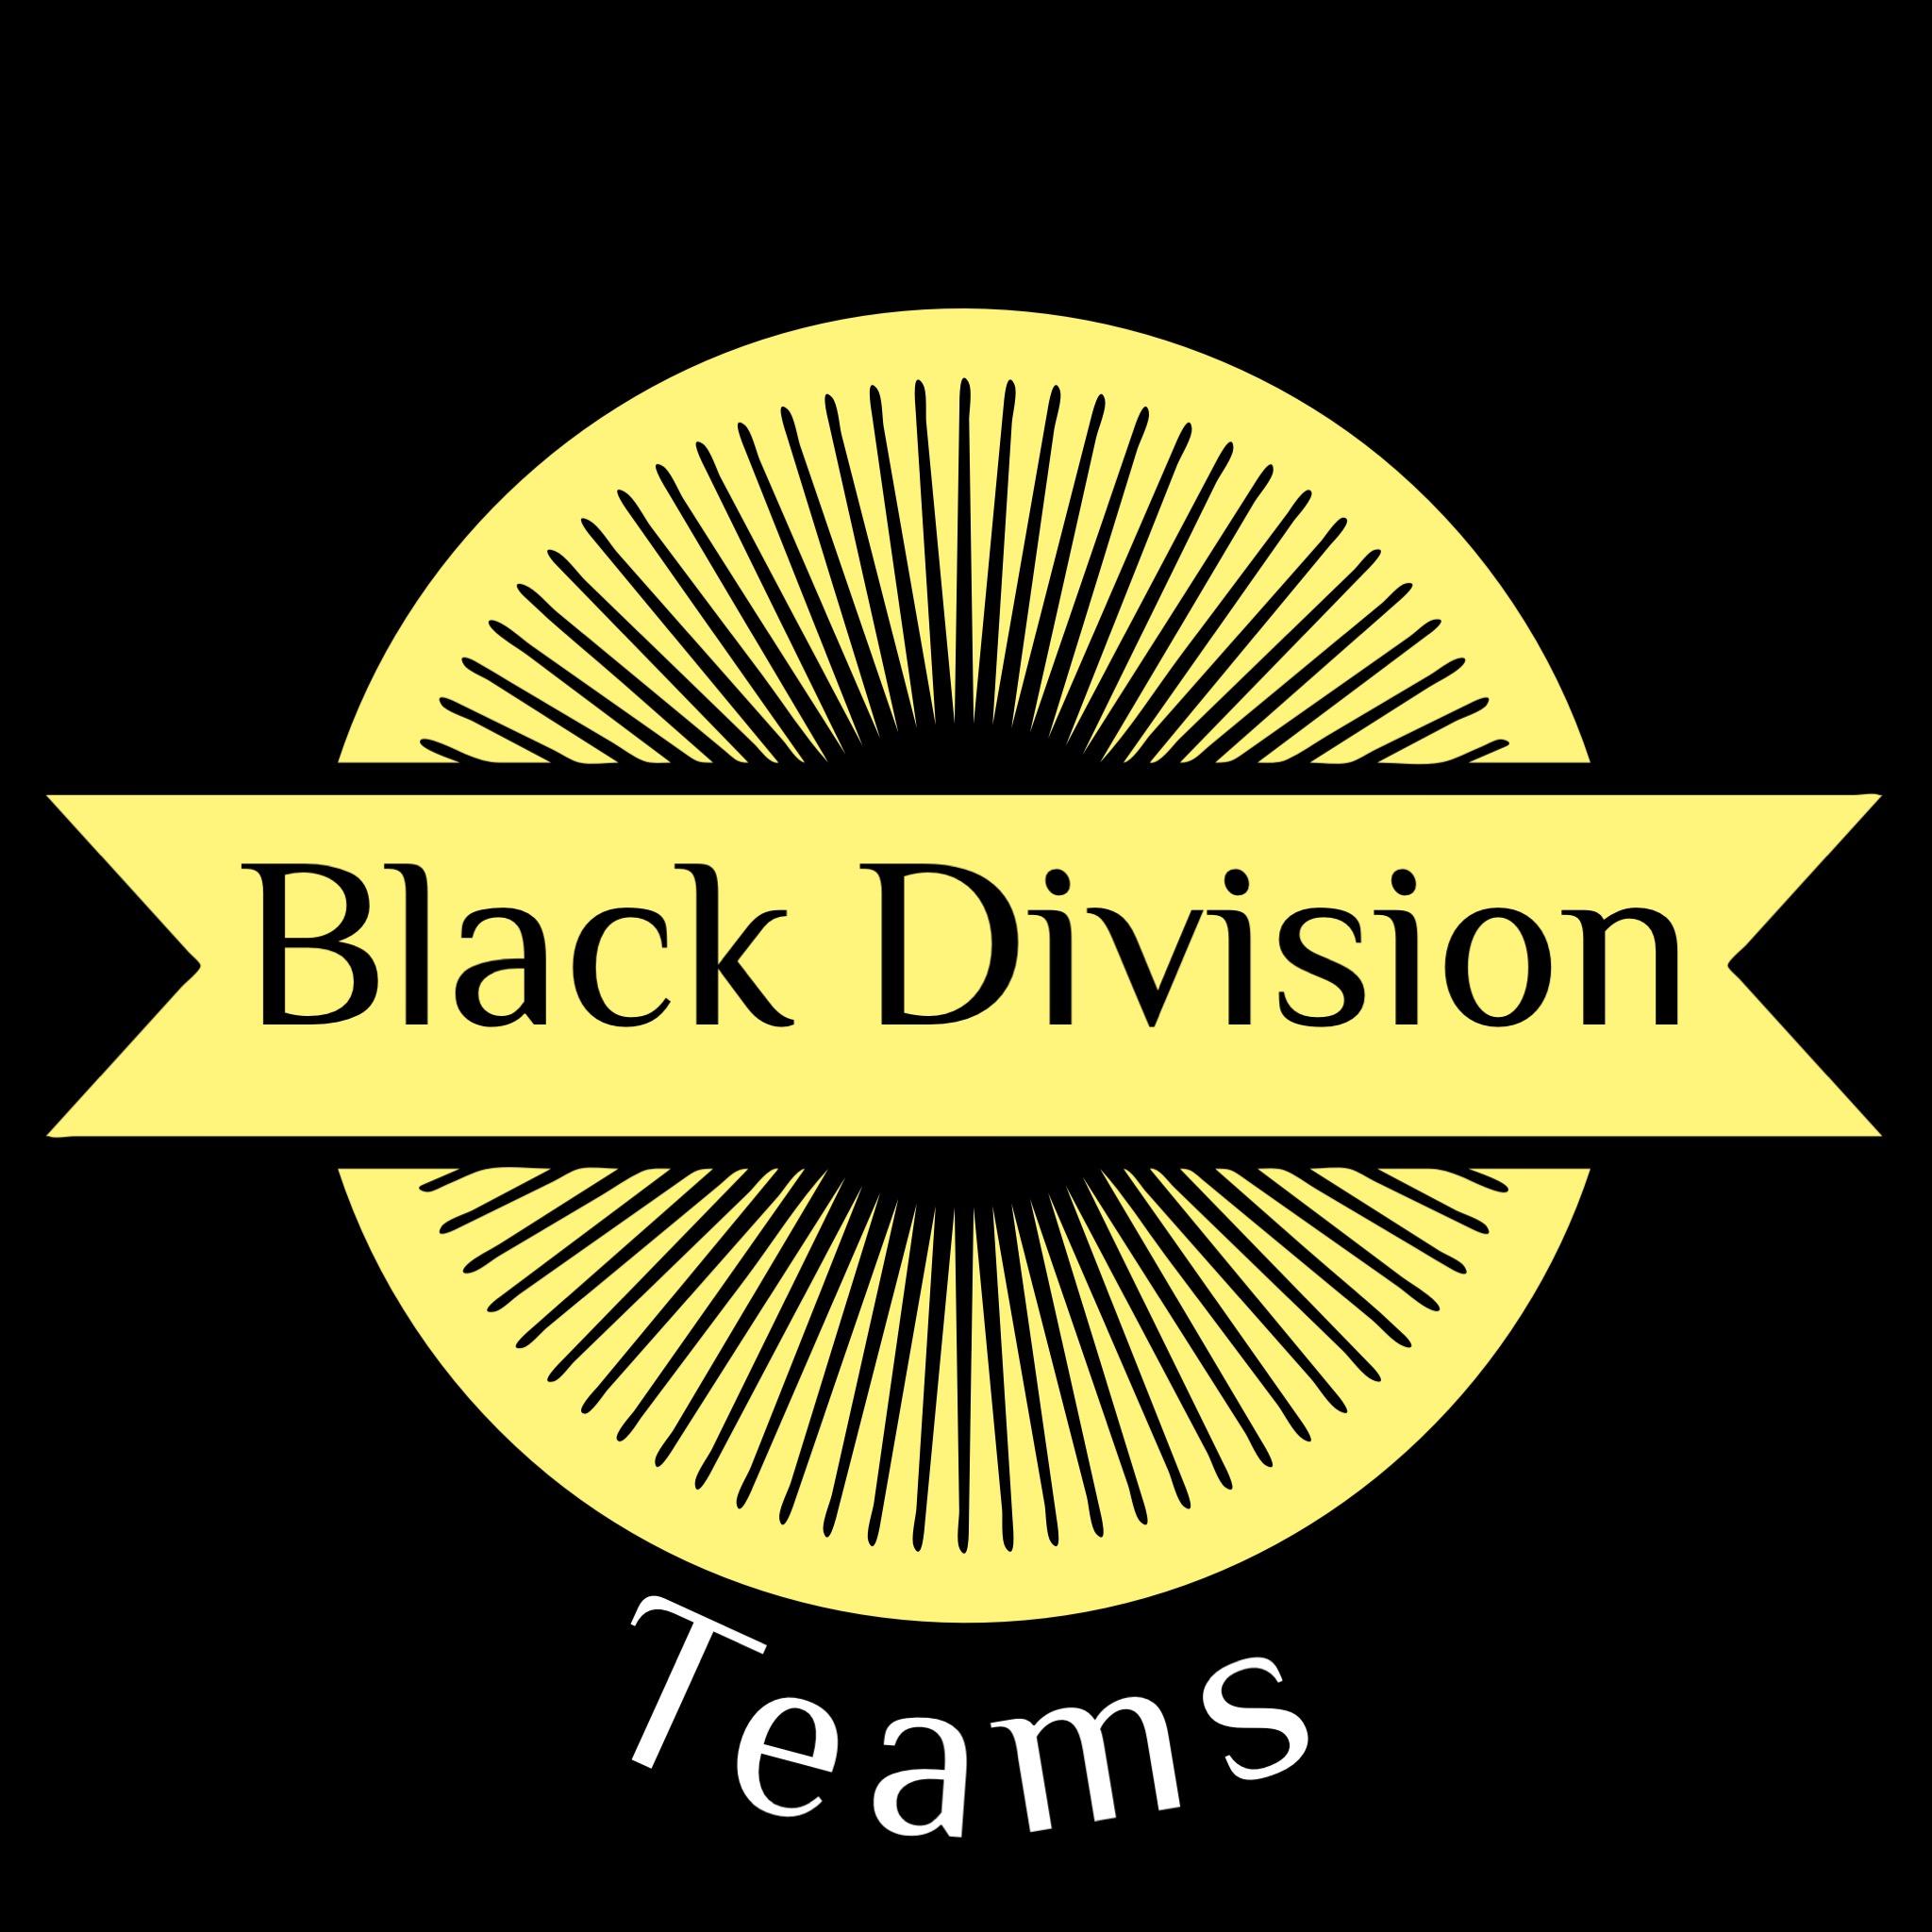 Black division teams.JPG